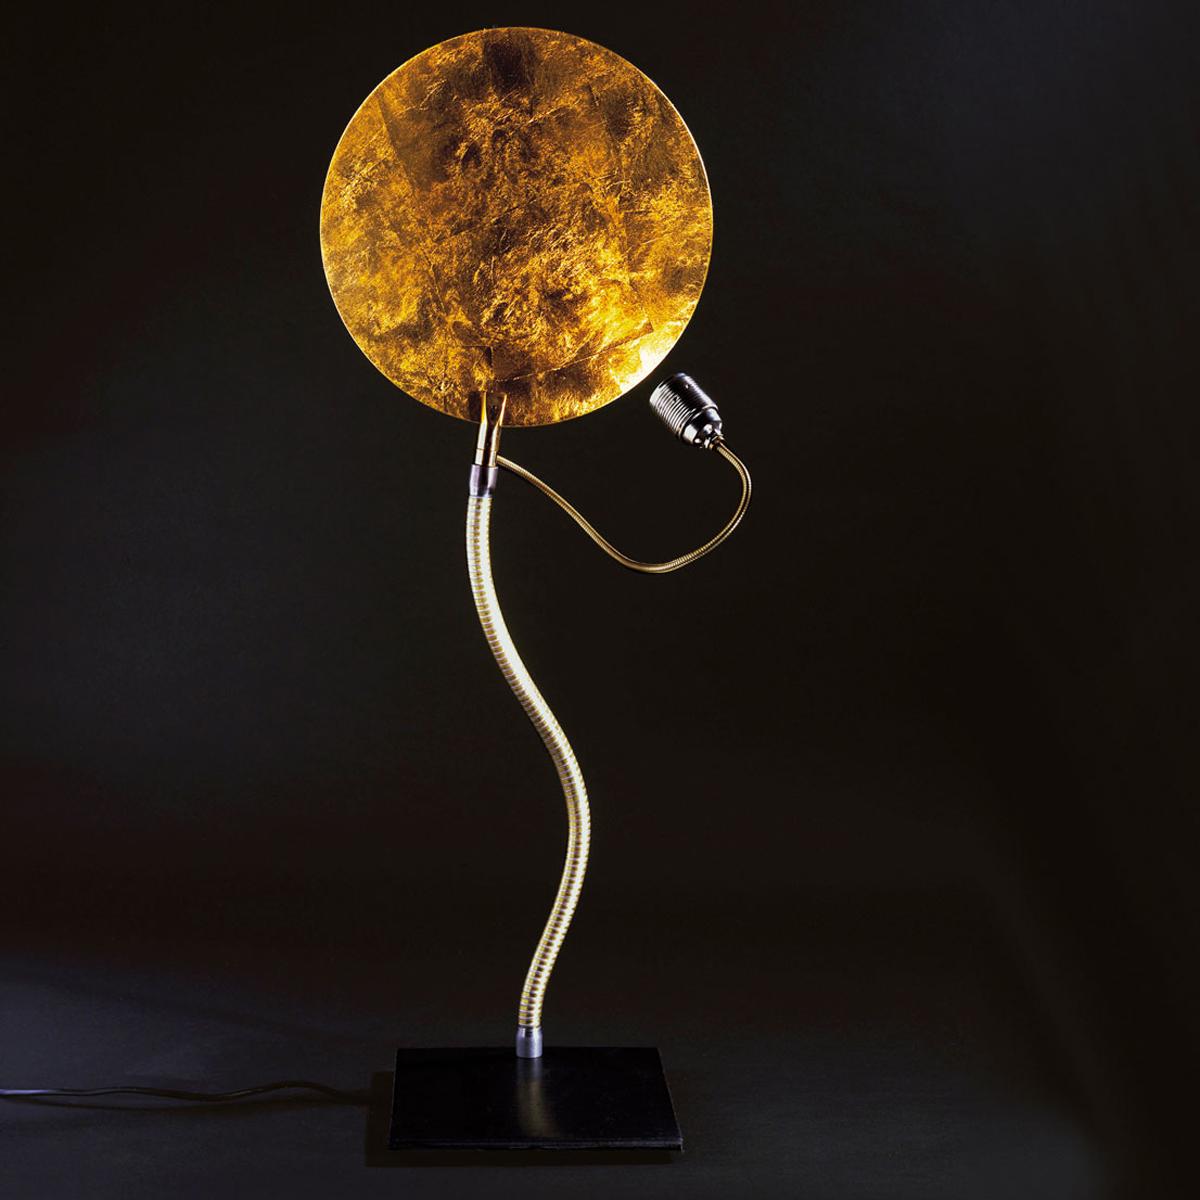 catellani smith luce d 39 oro. Black Bedroom Furniture Sets. Home Design Ideas